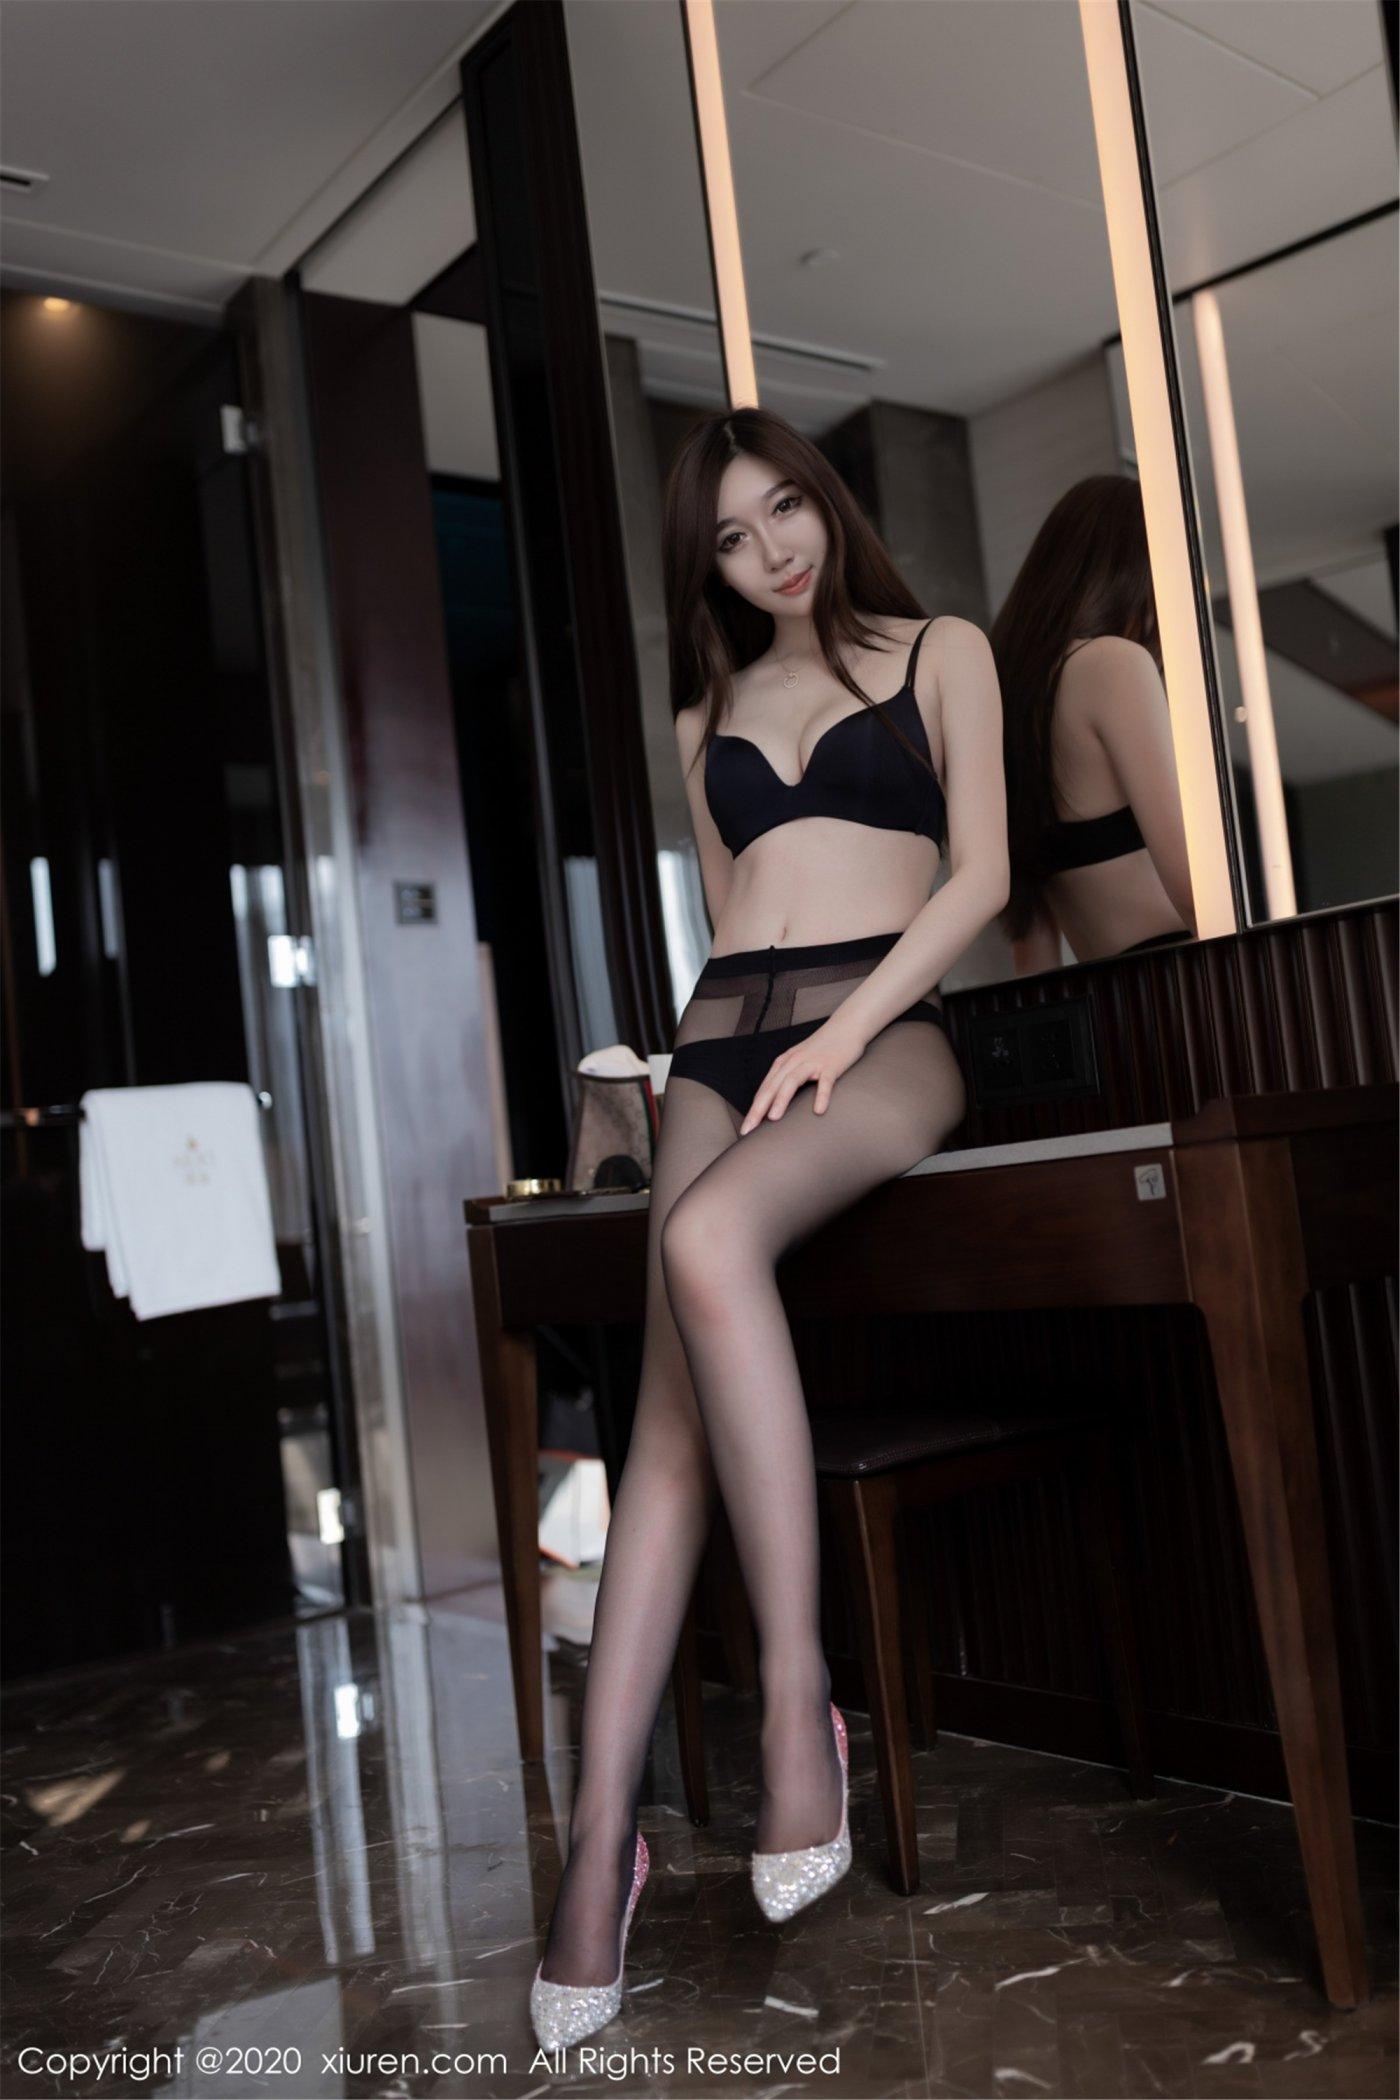 Victoria志玲(Vol. 2406) 性感mm-第3张